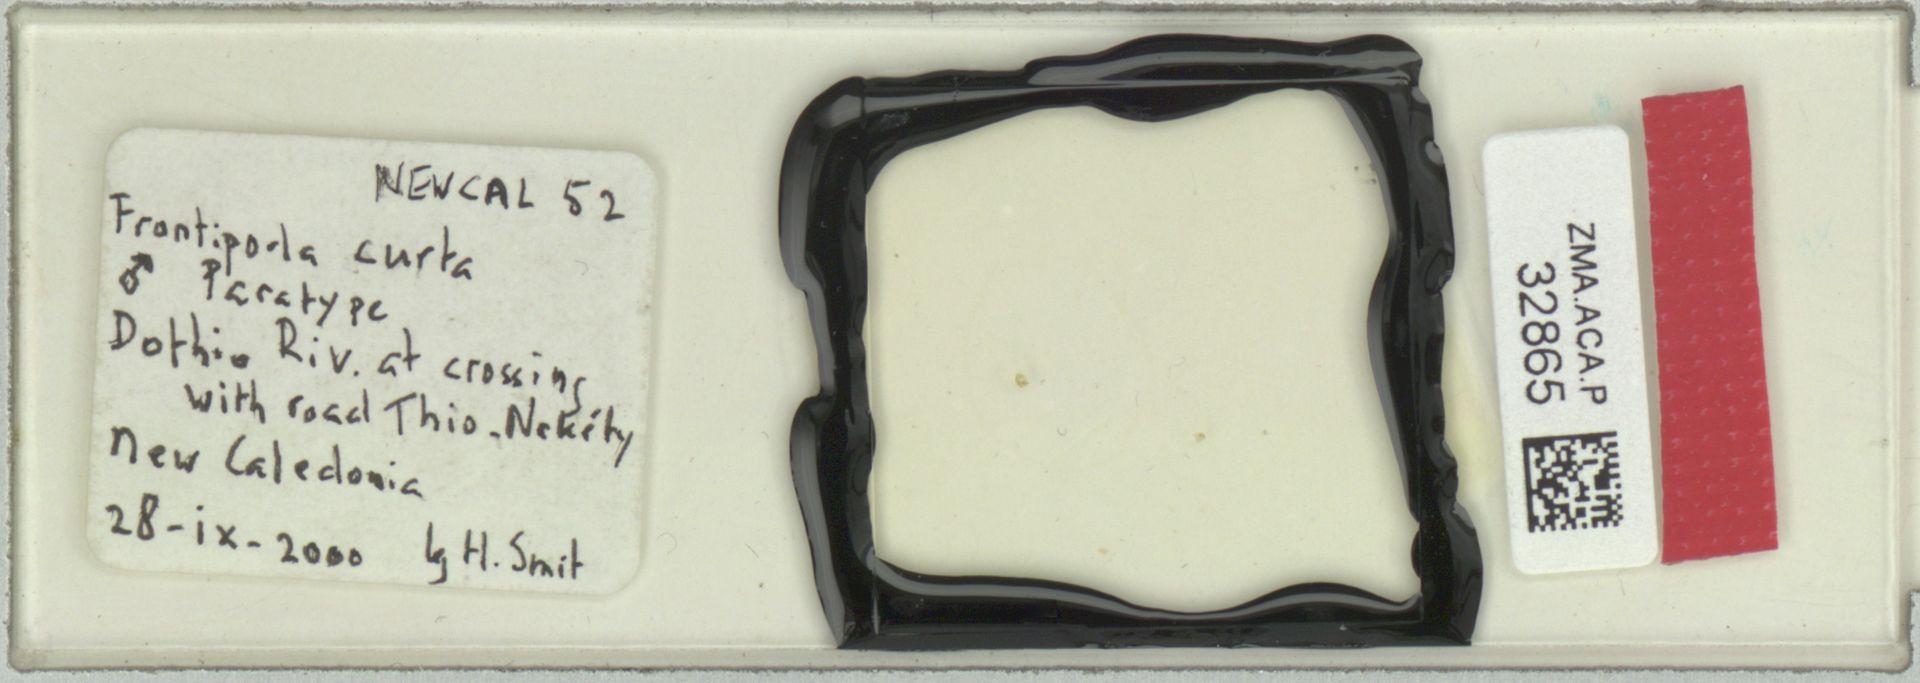 ZMA.ACA.P.32865 | Frontipoda curta Smit, 2002